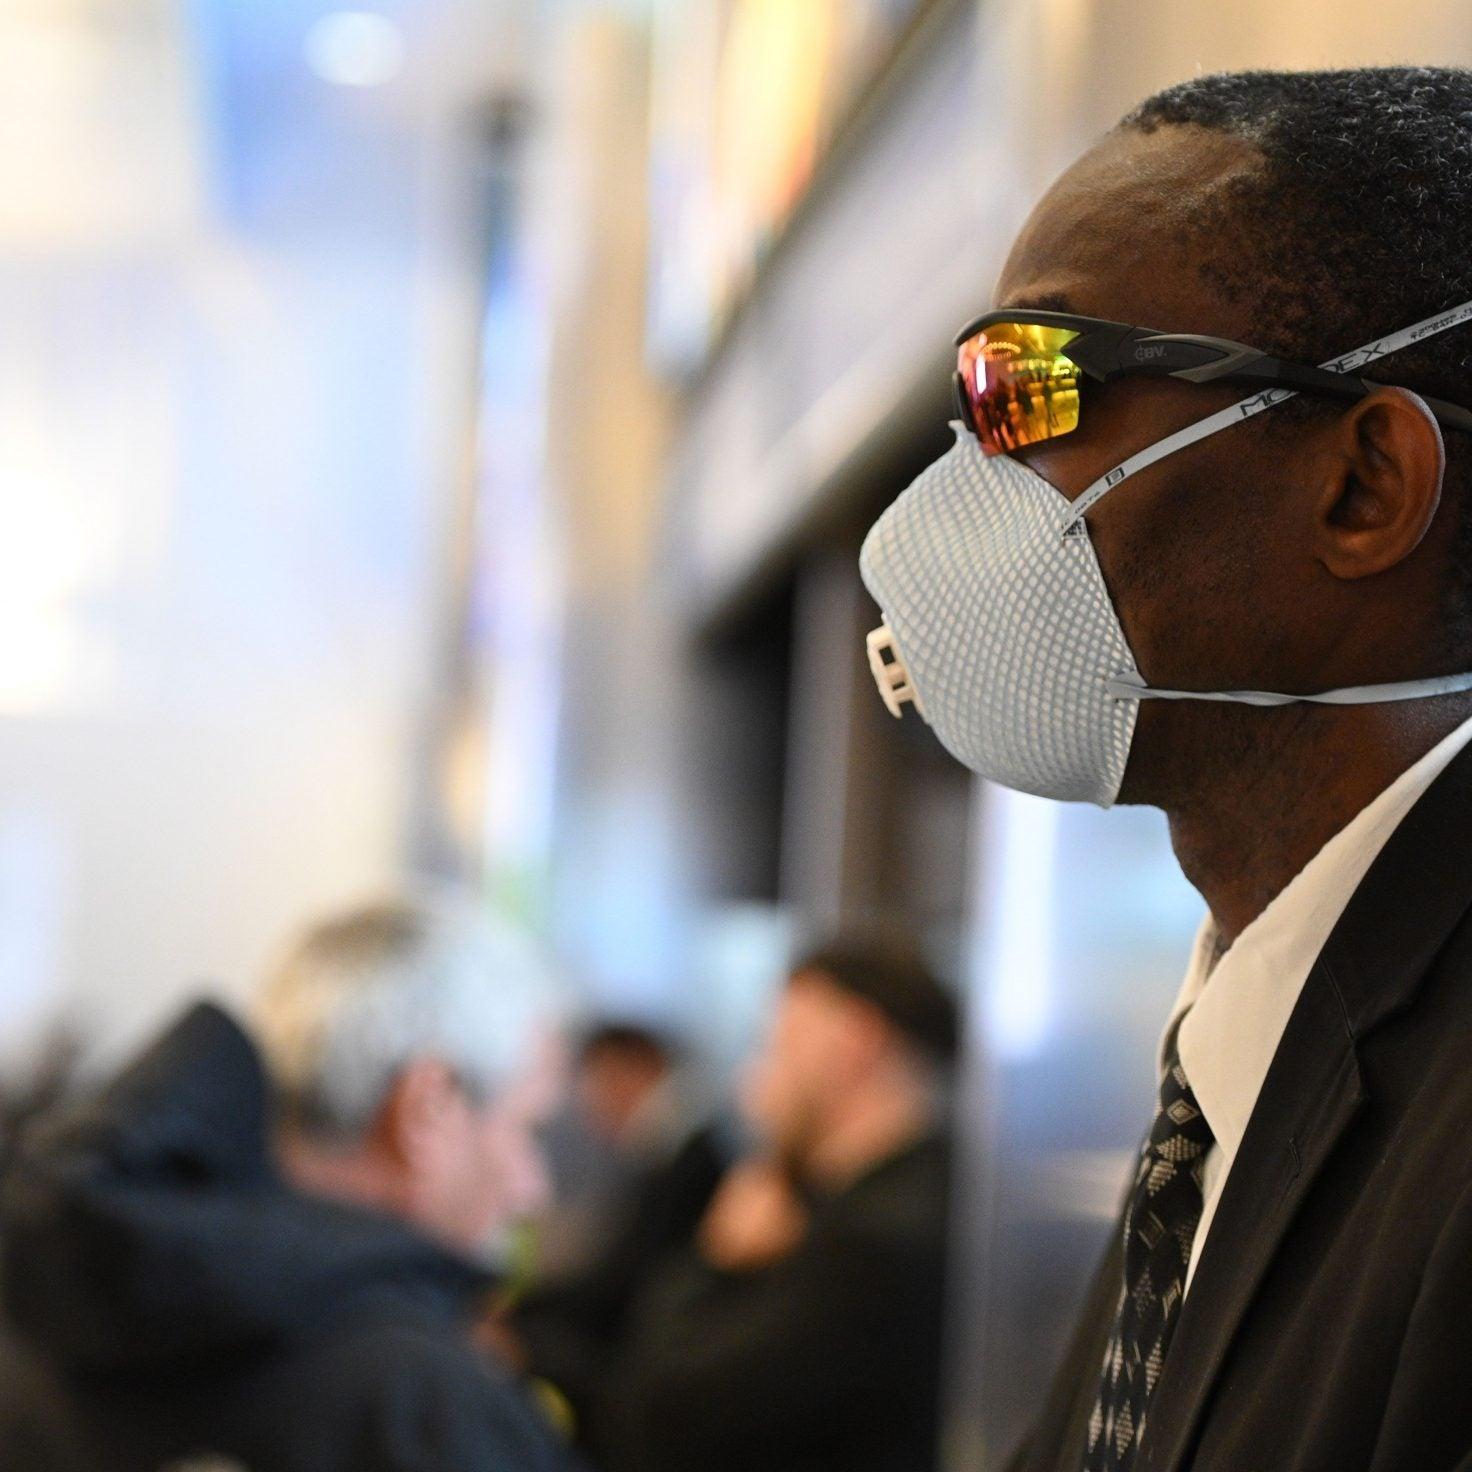 Trump Considers Reentry Ban For U.S. Citizens Amid Coronavirus Pandemic